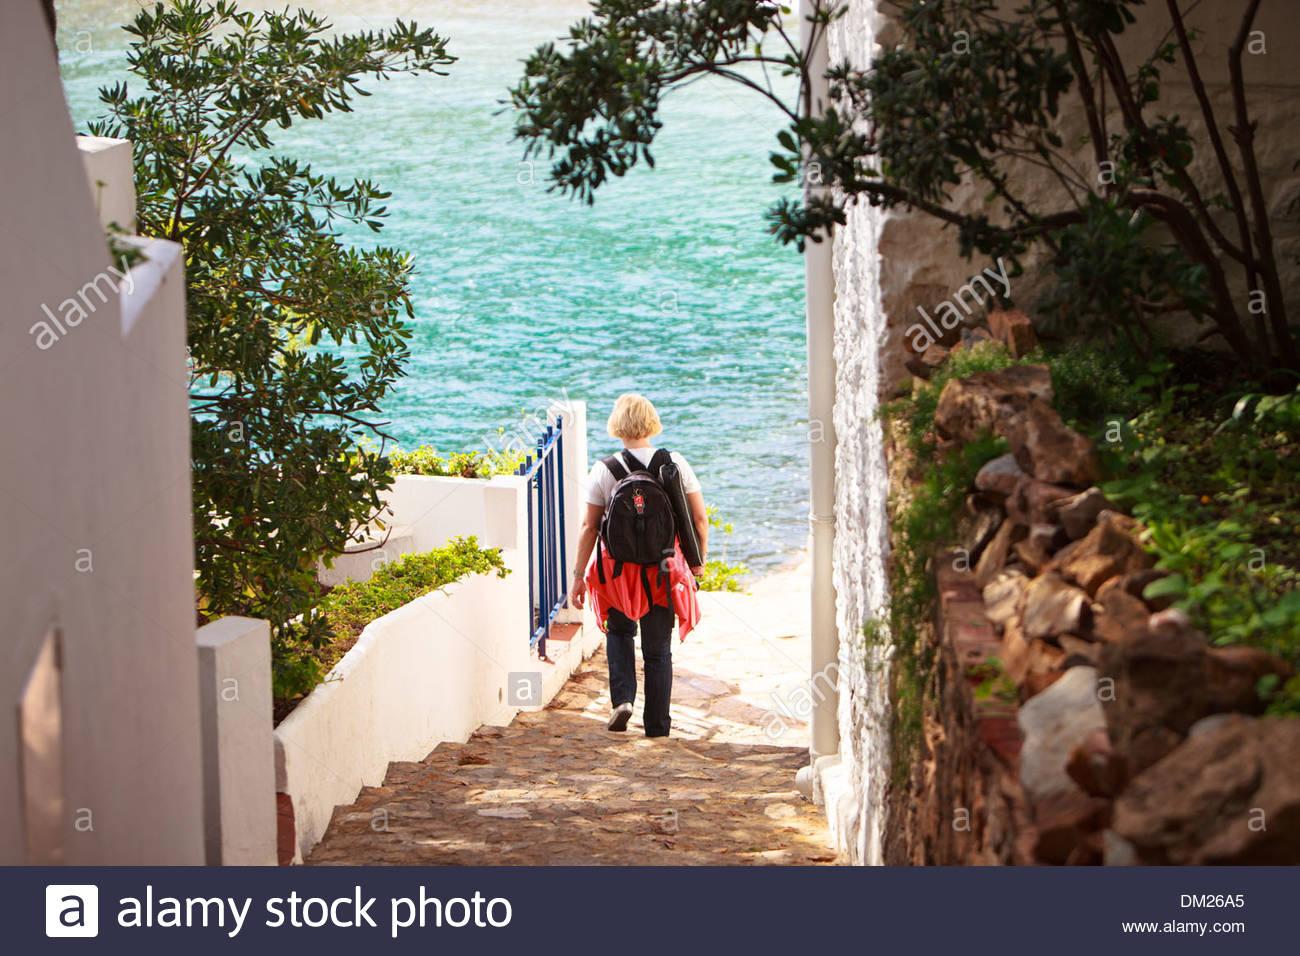 Tourist near Sa Tuna beach, Costa Brava, Catalonia, Spain - Stock Image